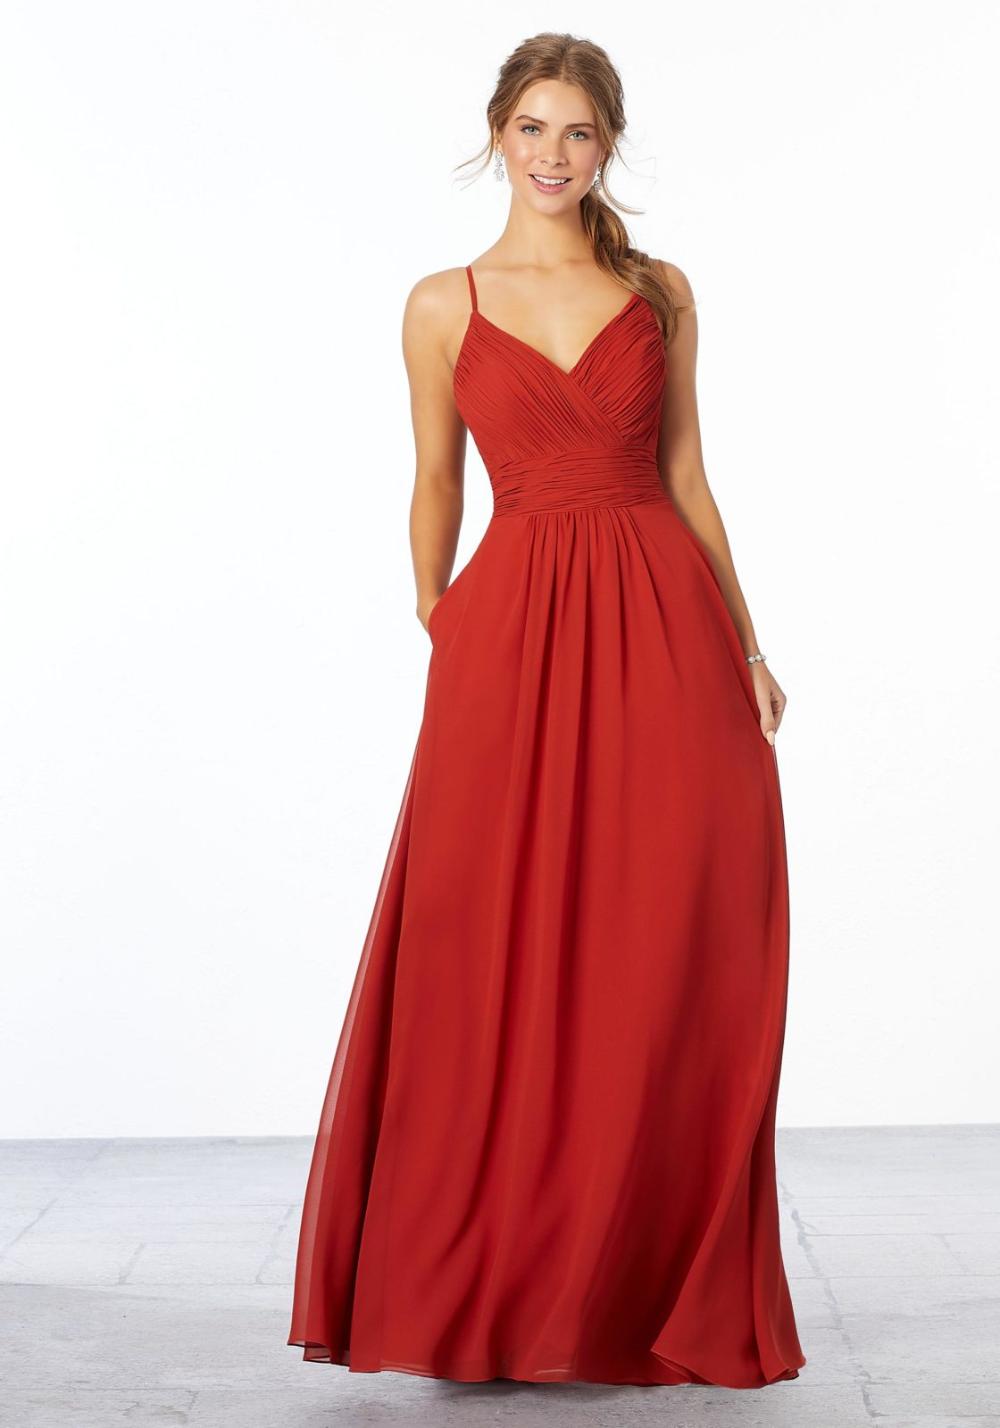 Aline, Ruched Chiffon Bridesmaid Dress Morilee Mori